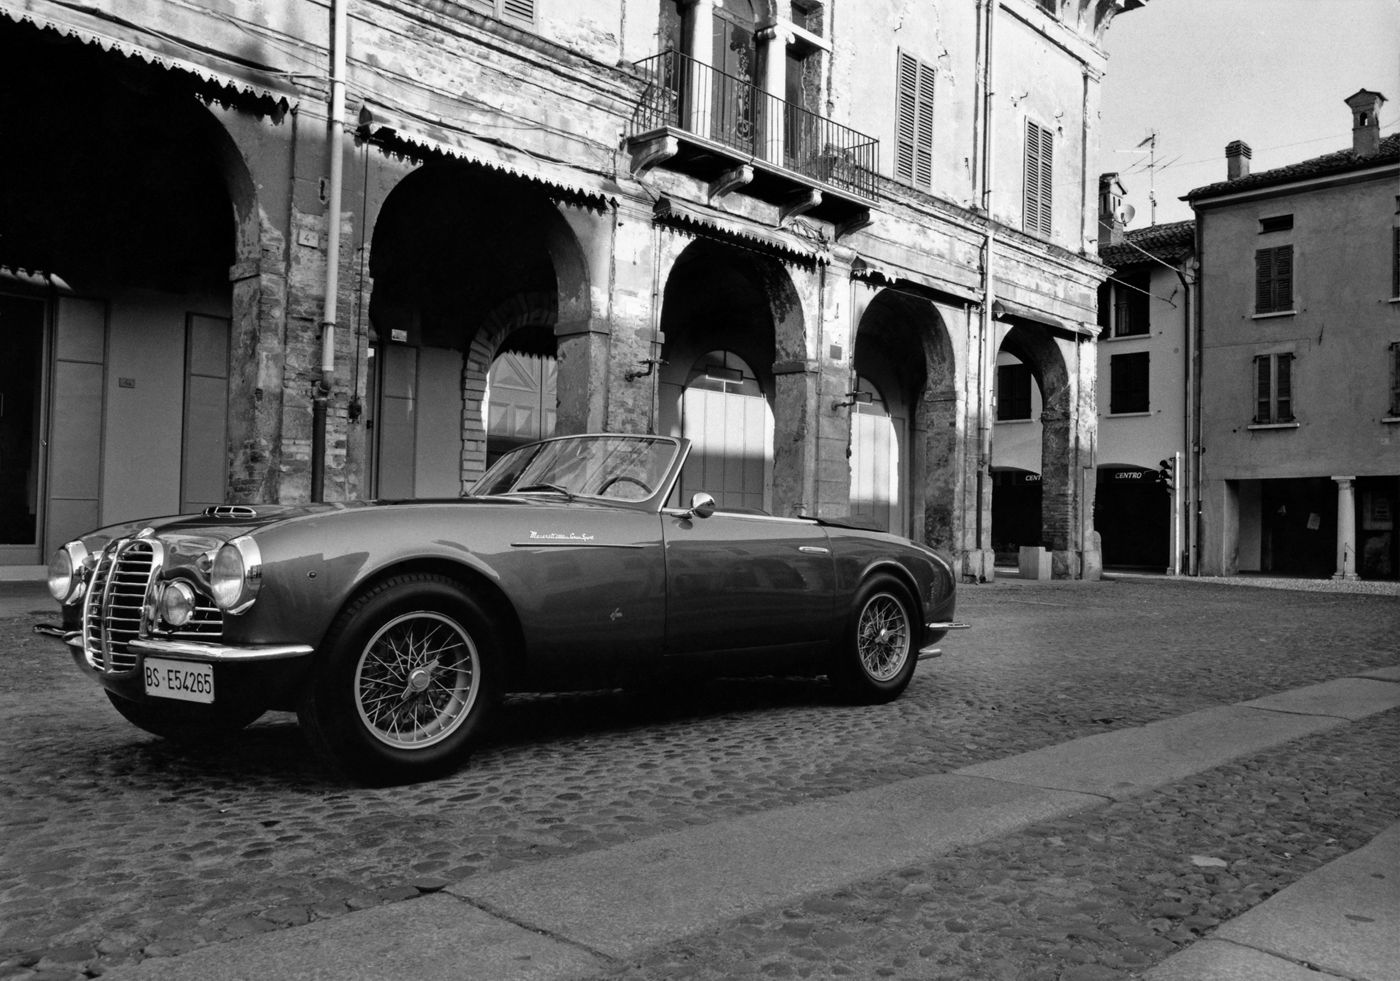 Maserati Classic - GranTurismo 2000 - carrosserie noire - vue latérale